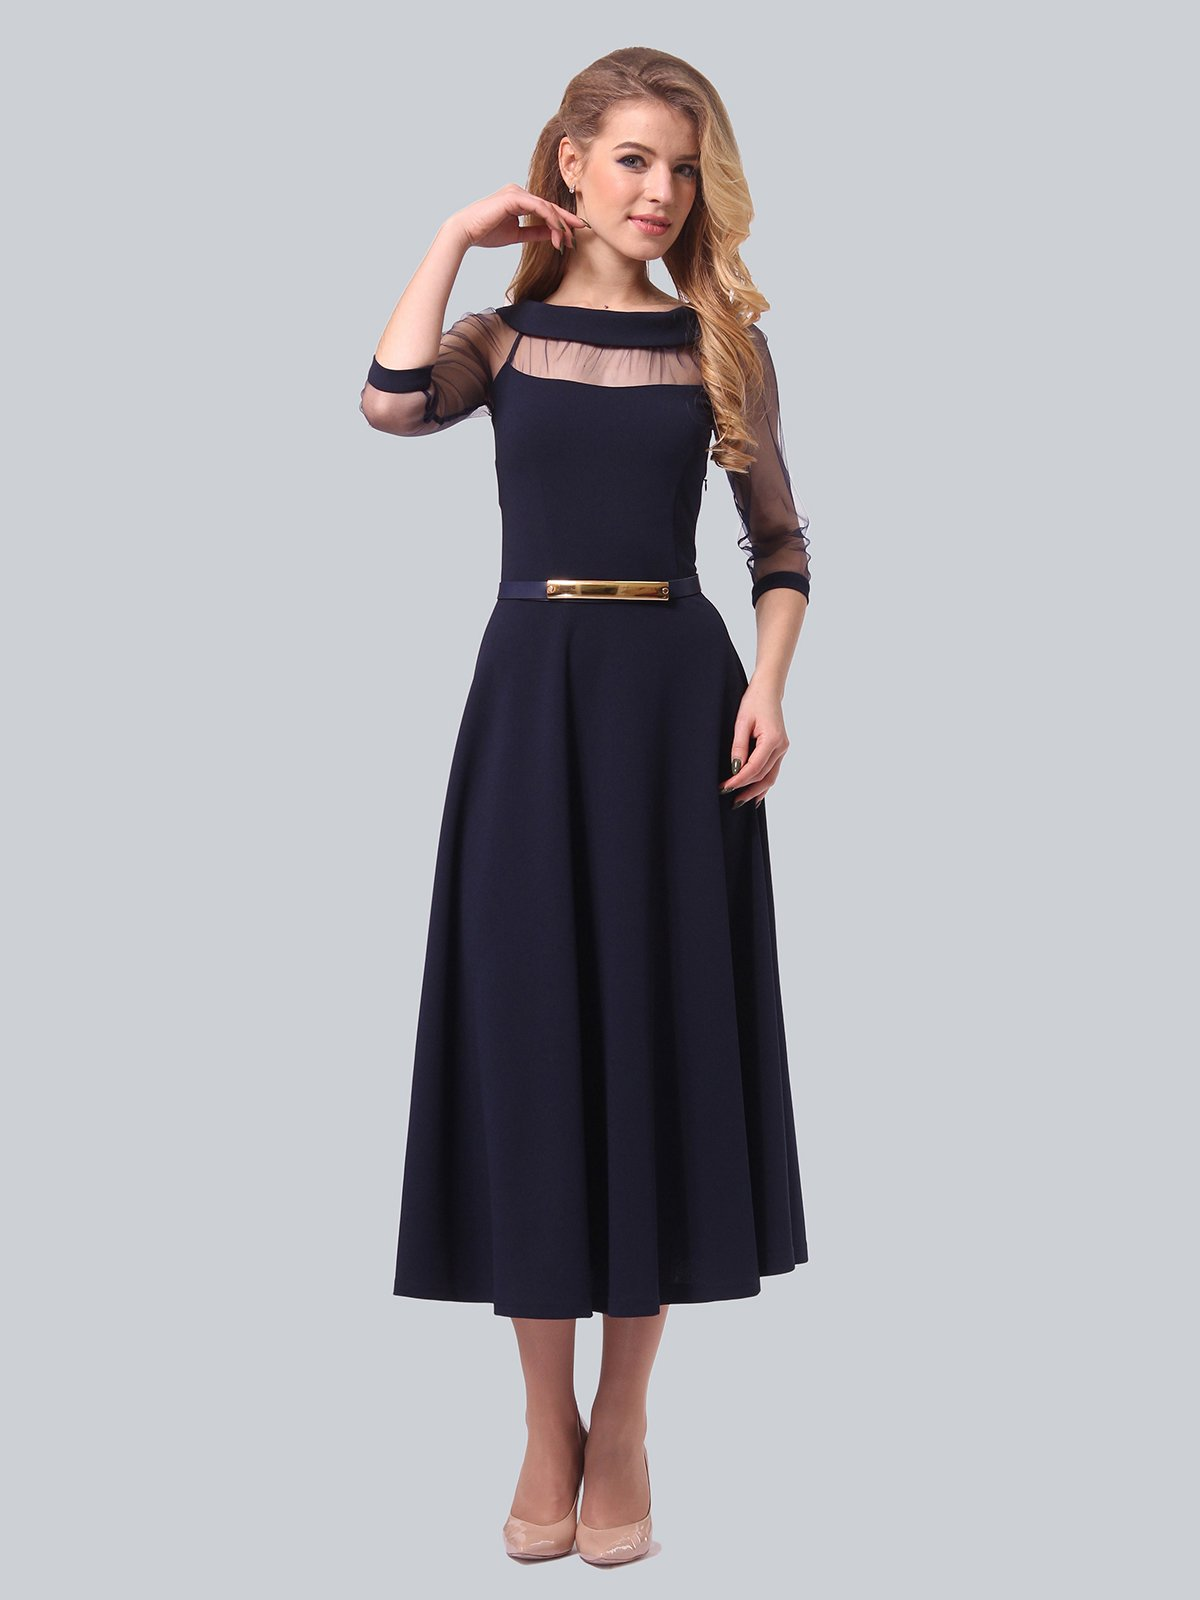 Платье темно-синее | 3879718 | фото 3